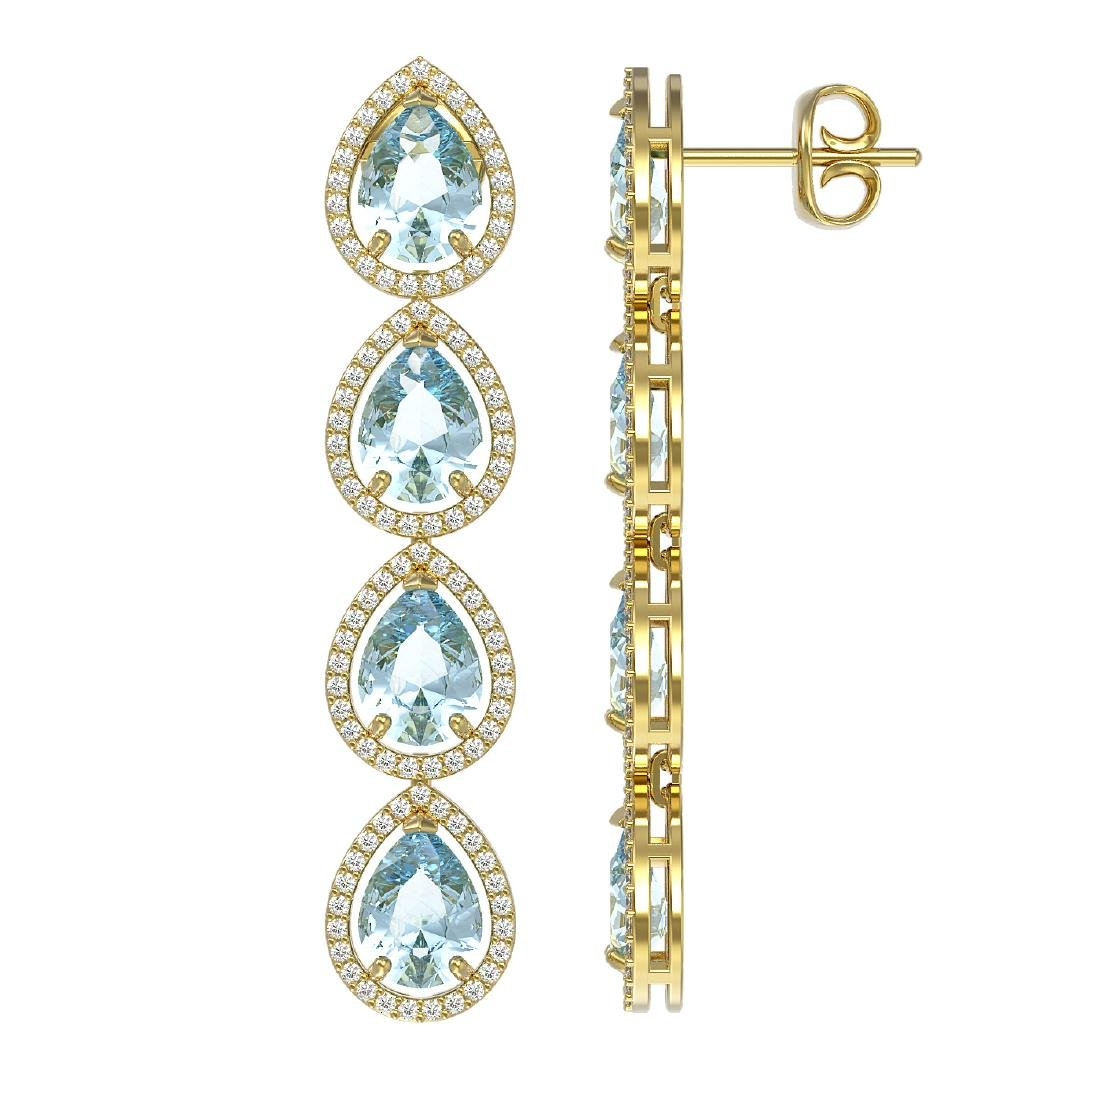 10.56 CTW Aquamarine & Diamond Halo Earrings 10K Yellow - 2